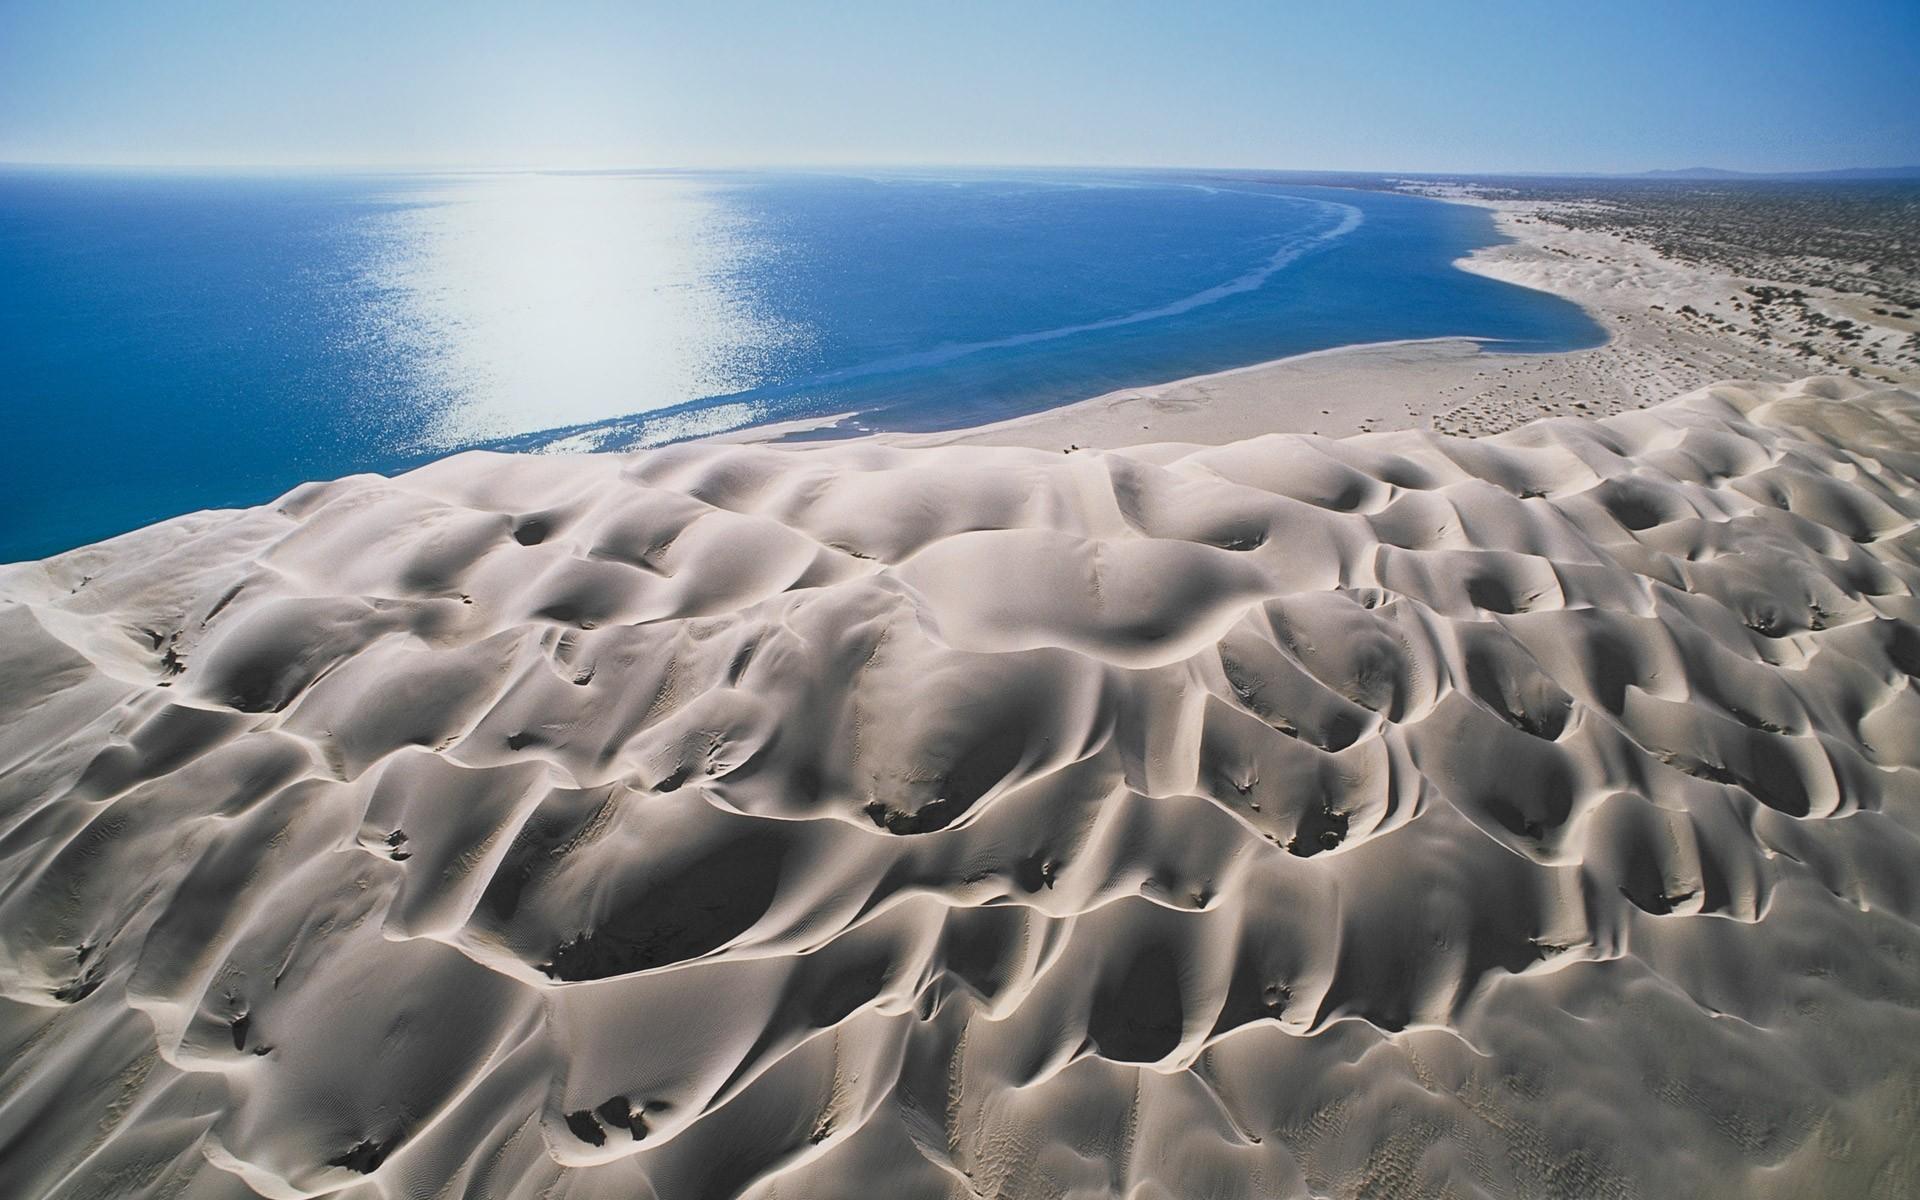 General 1920x1200 landscape beach nature dune sea sand wind erosion water blue Mexico